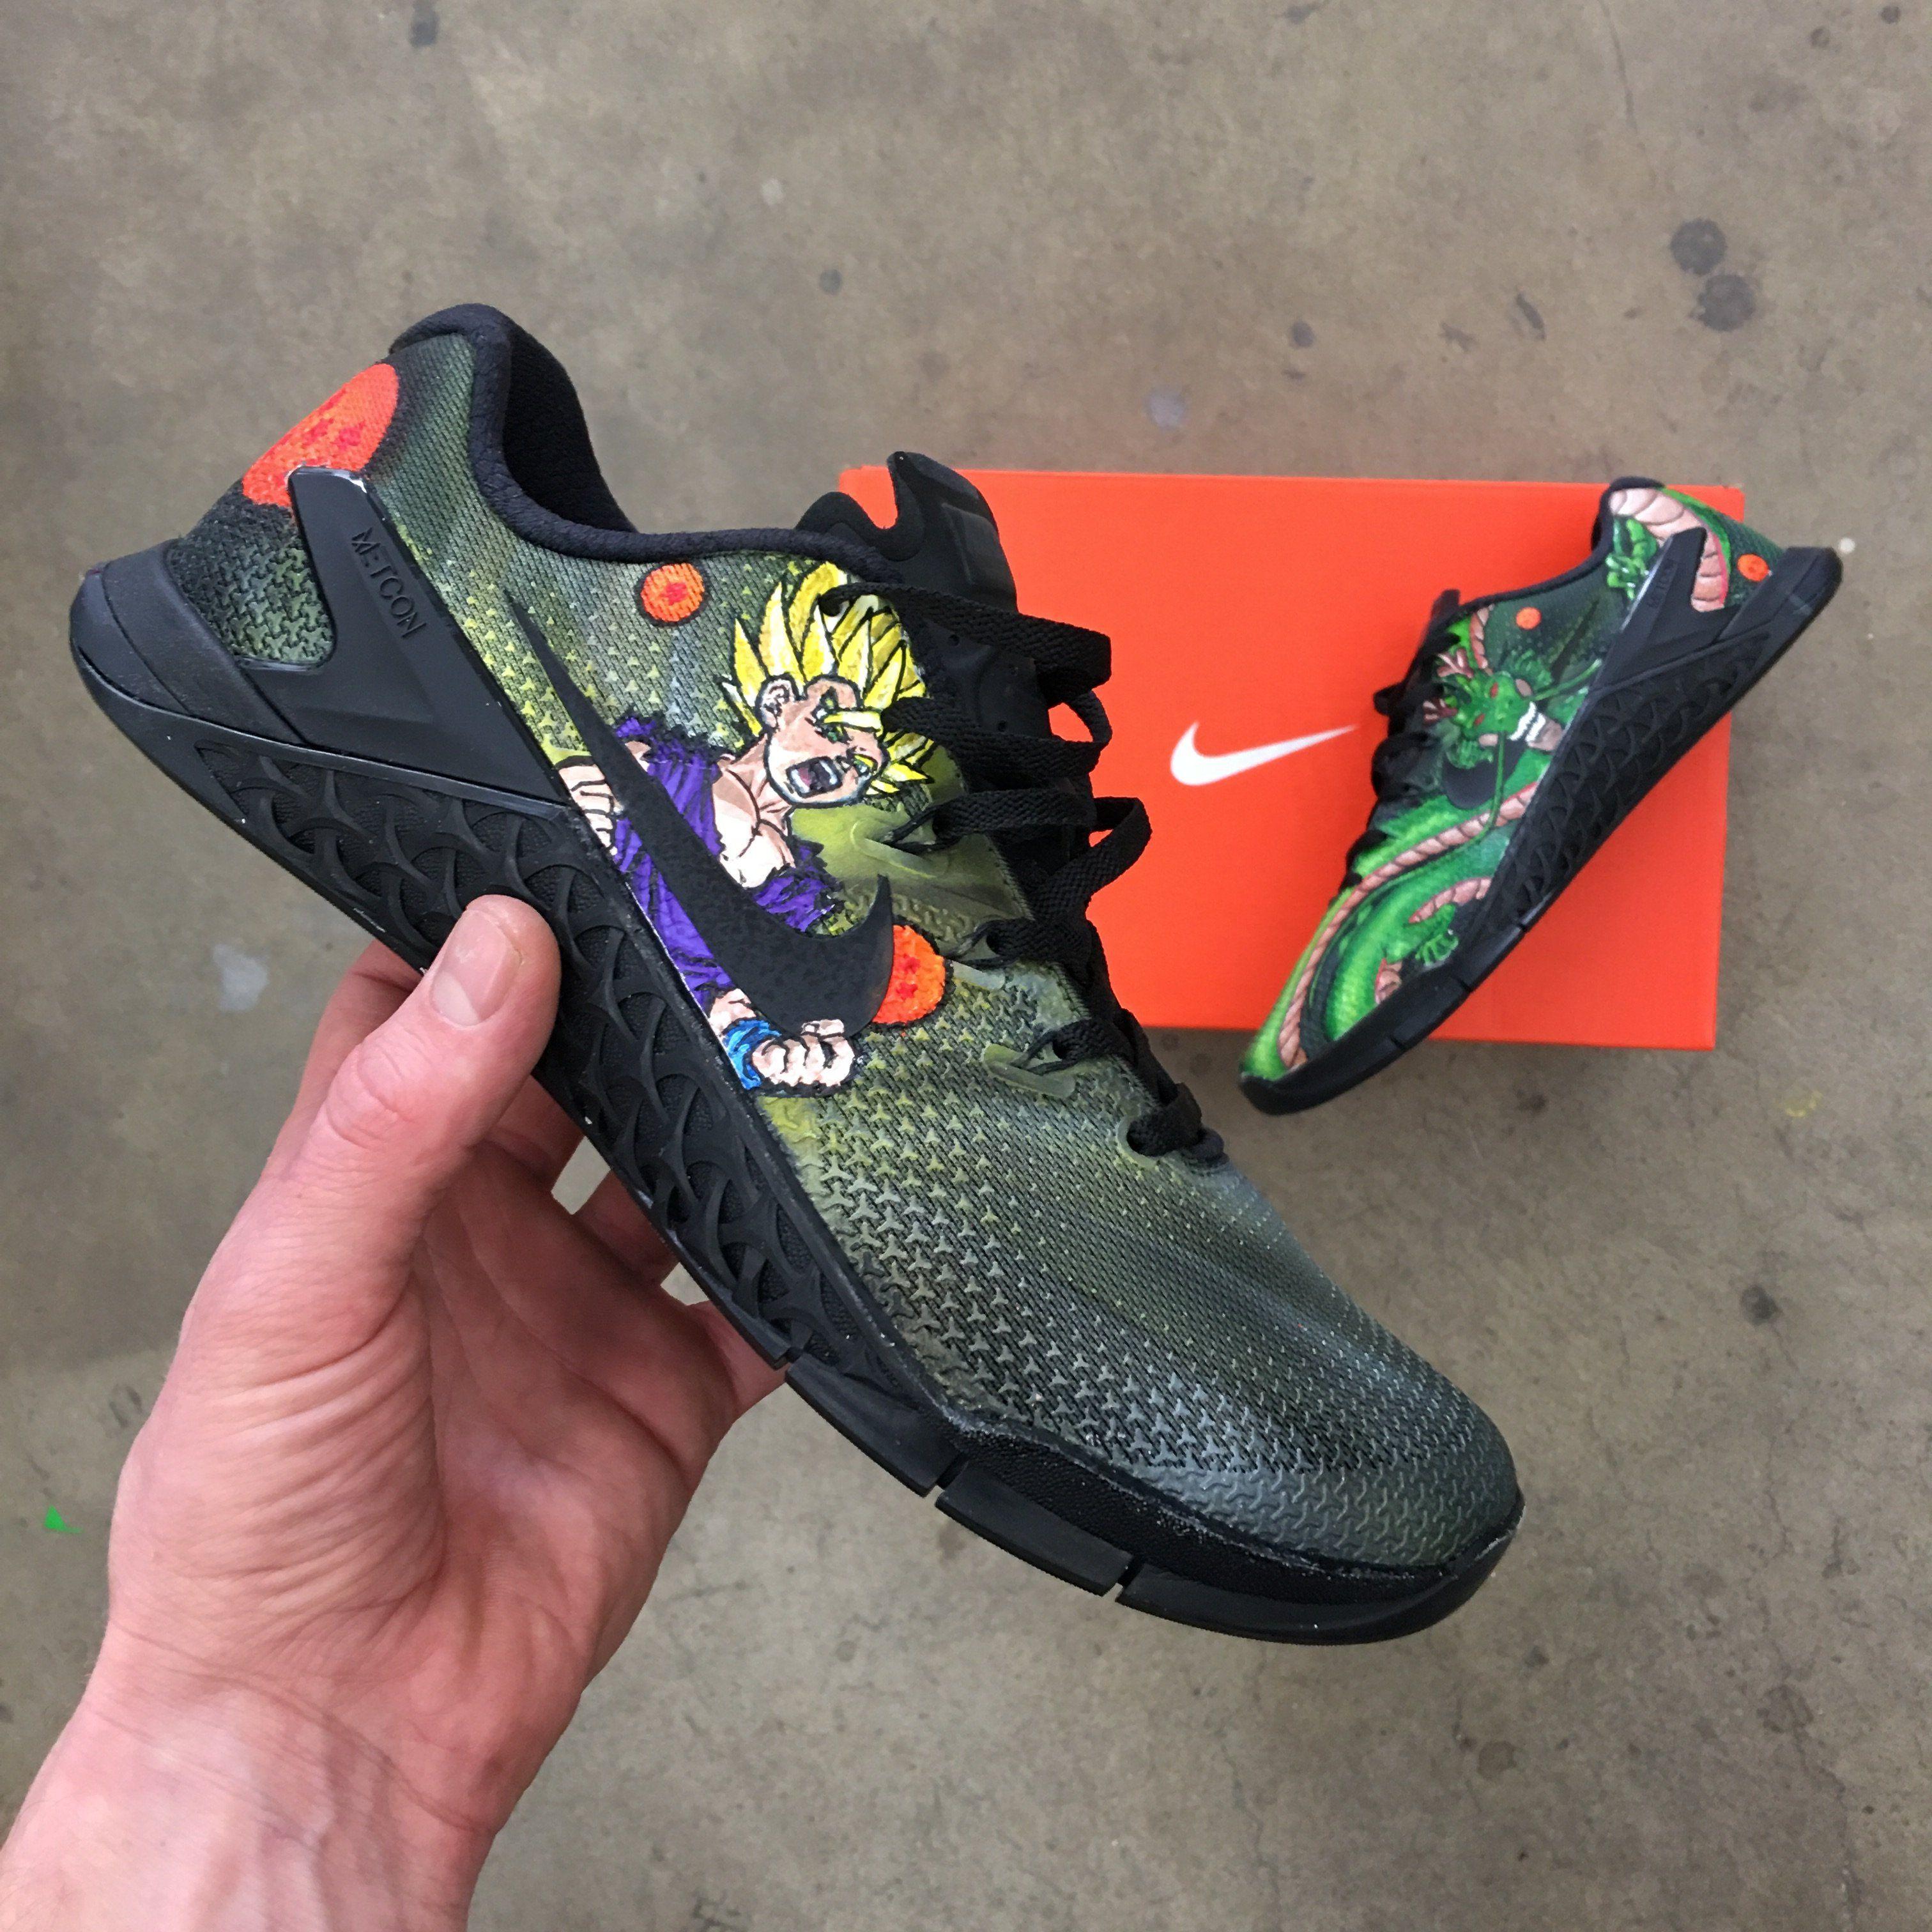 Dragon Ball Z Themed Nike Metcon 4s